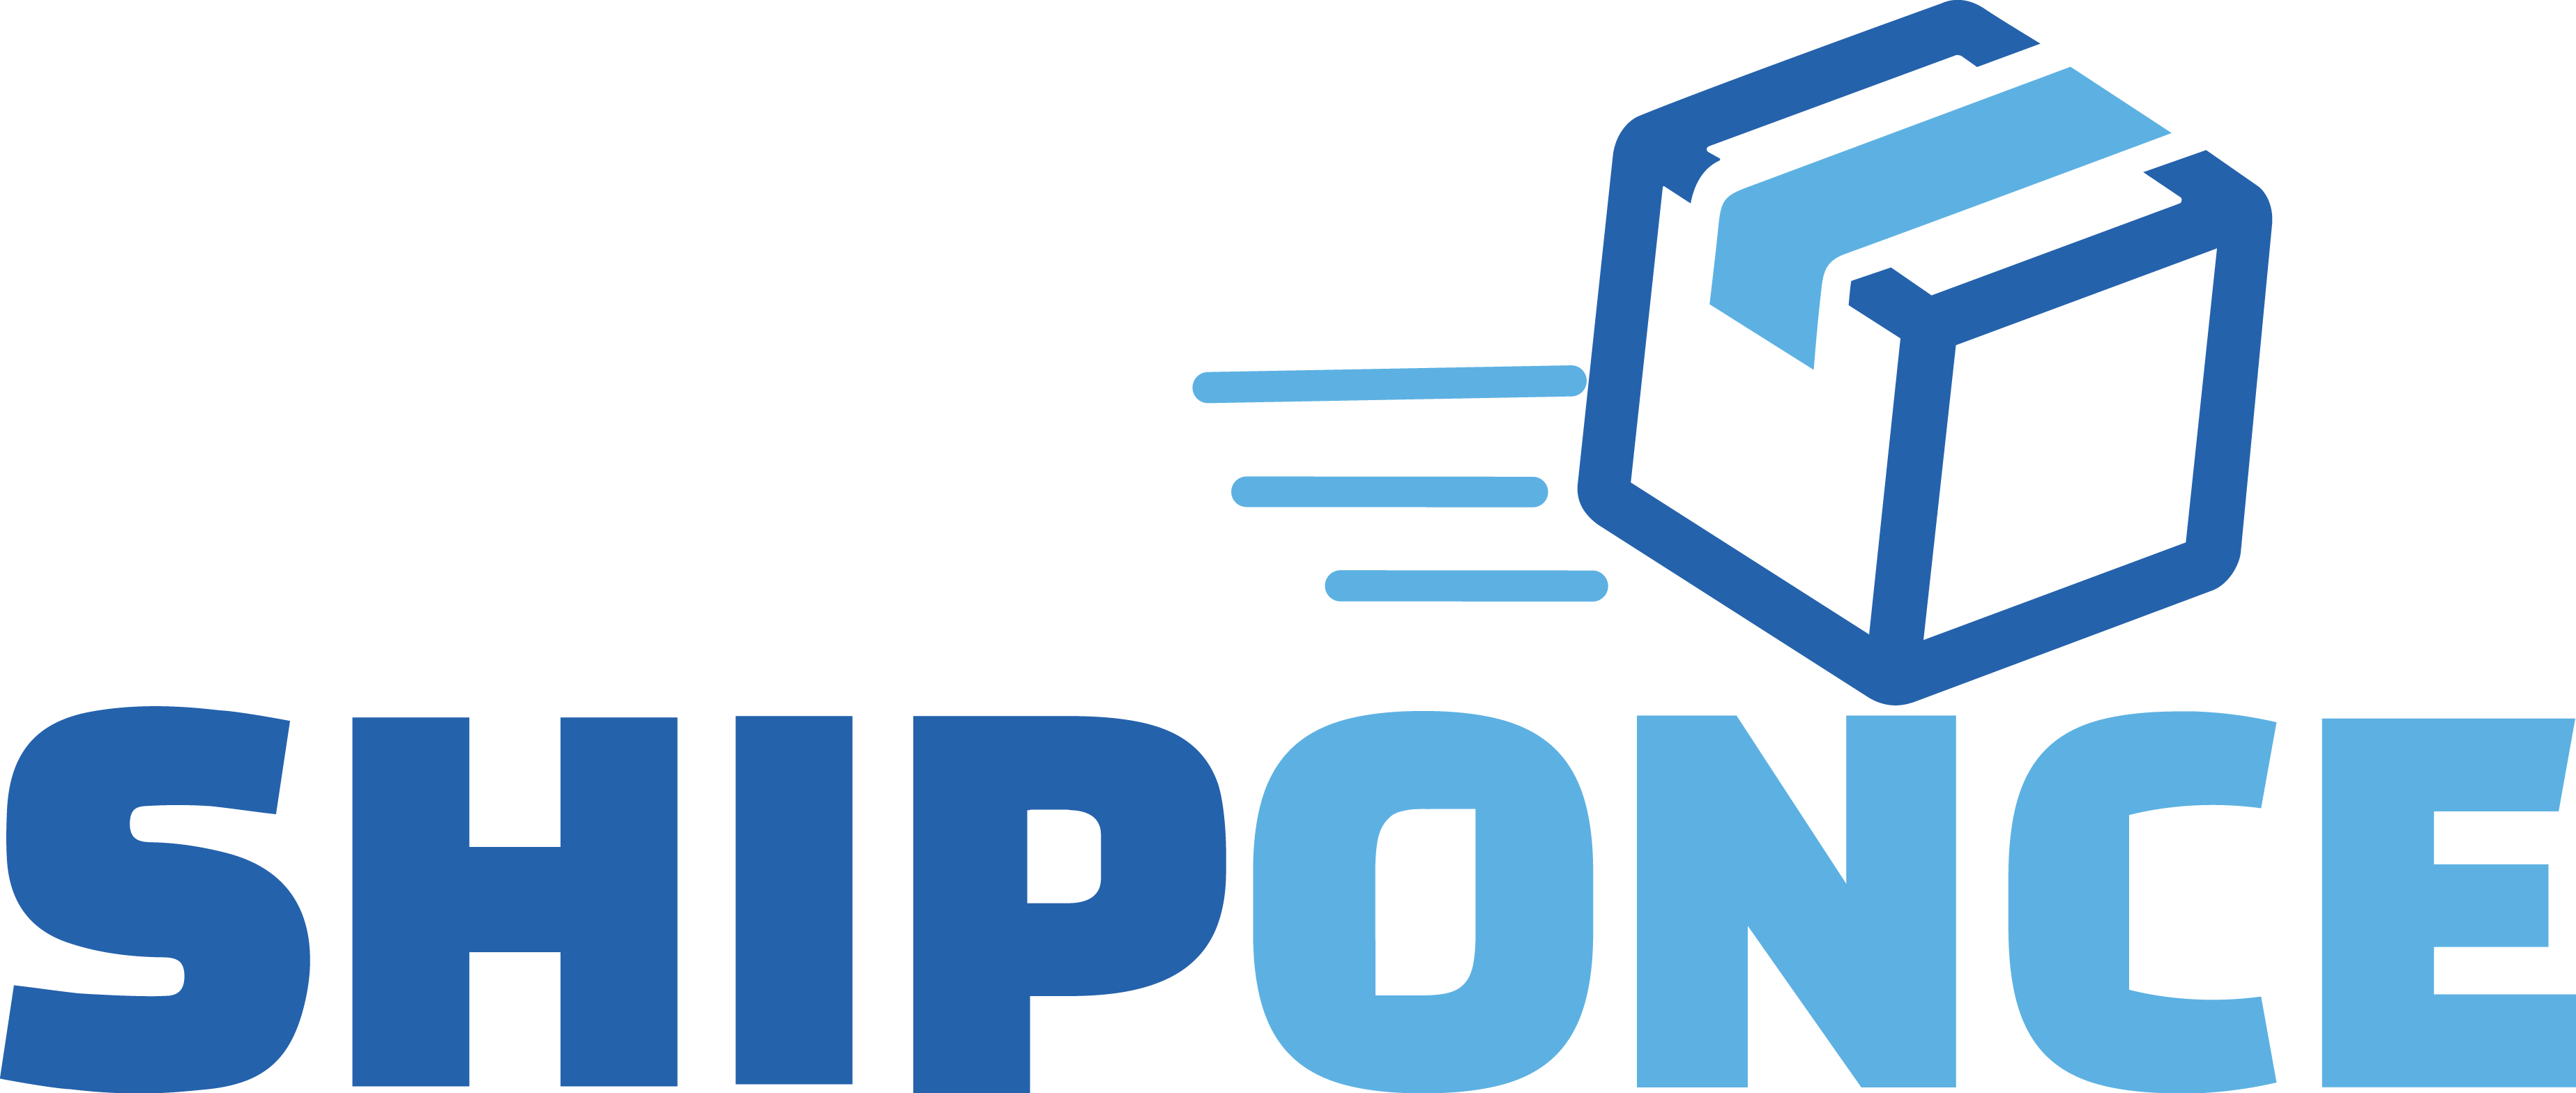 provide final files for this homemade logo